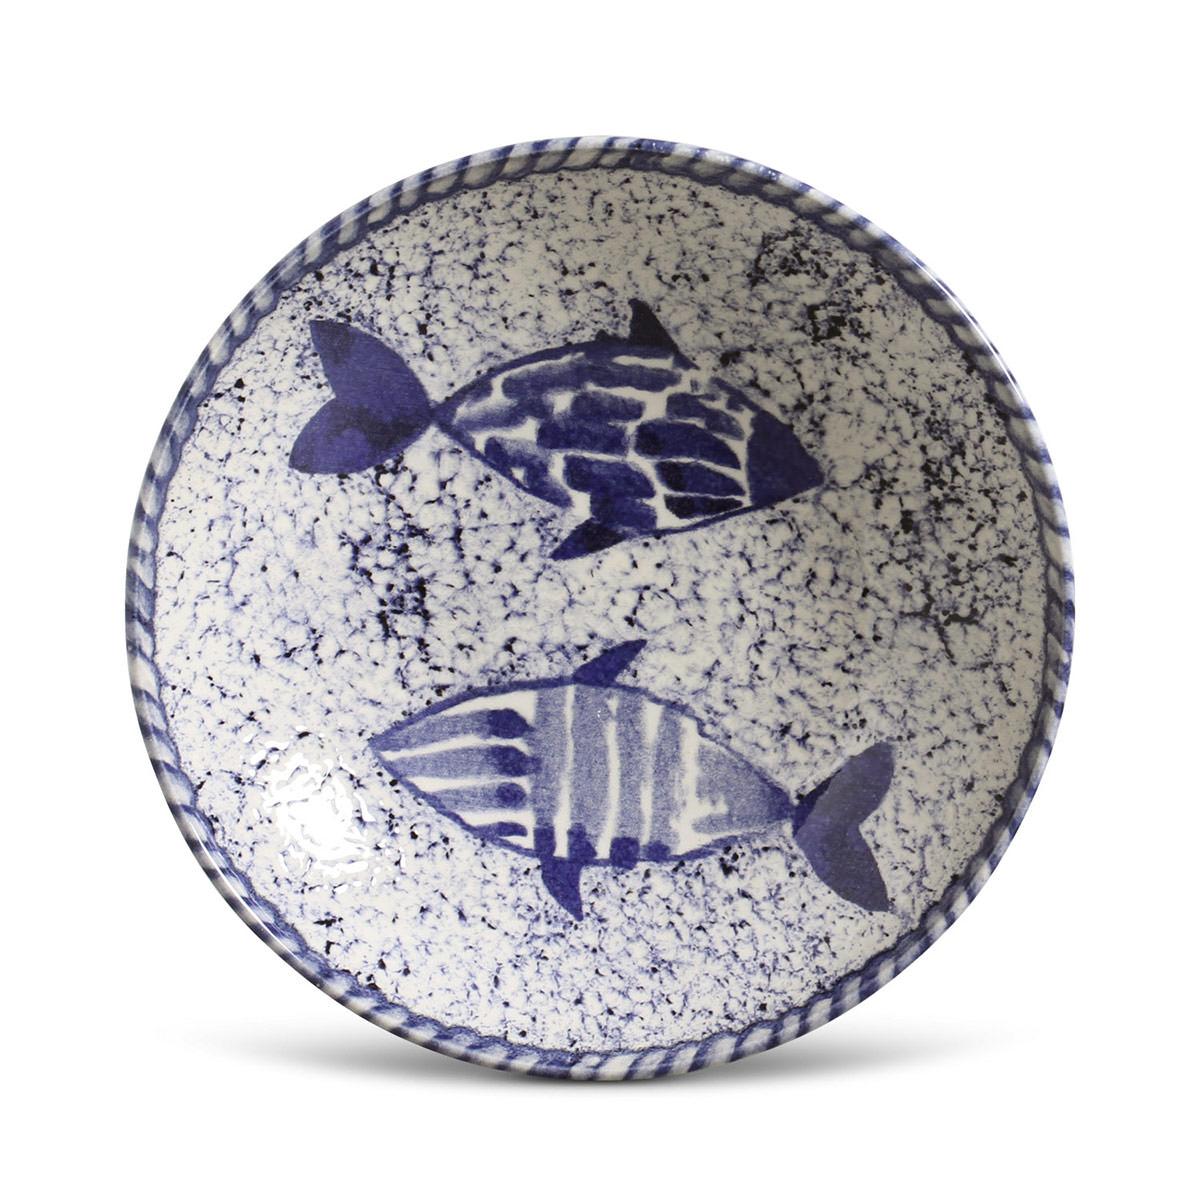 Jogo de Jantar Fish 30pçs - Porto Brasil